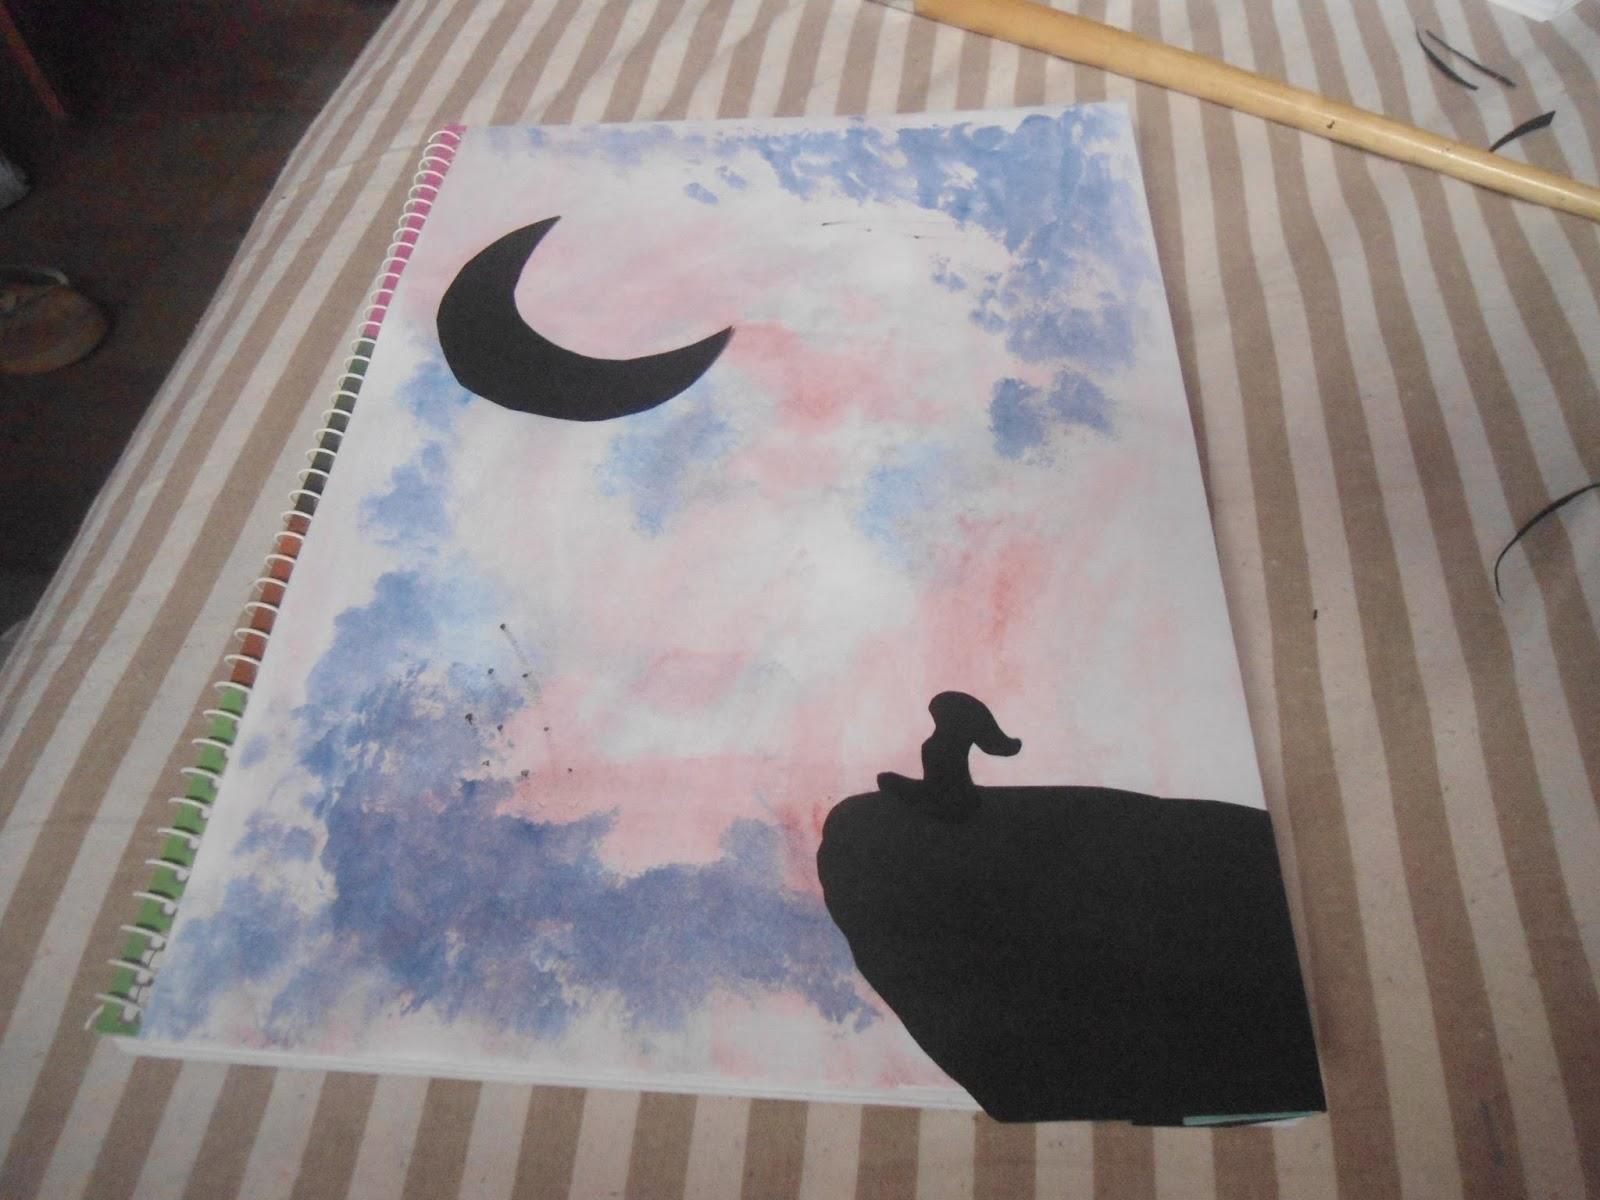 Dibujos Para Portadas De Cuaderno: Portadas De Cuaderno